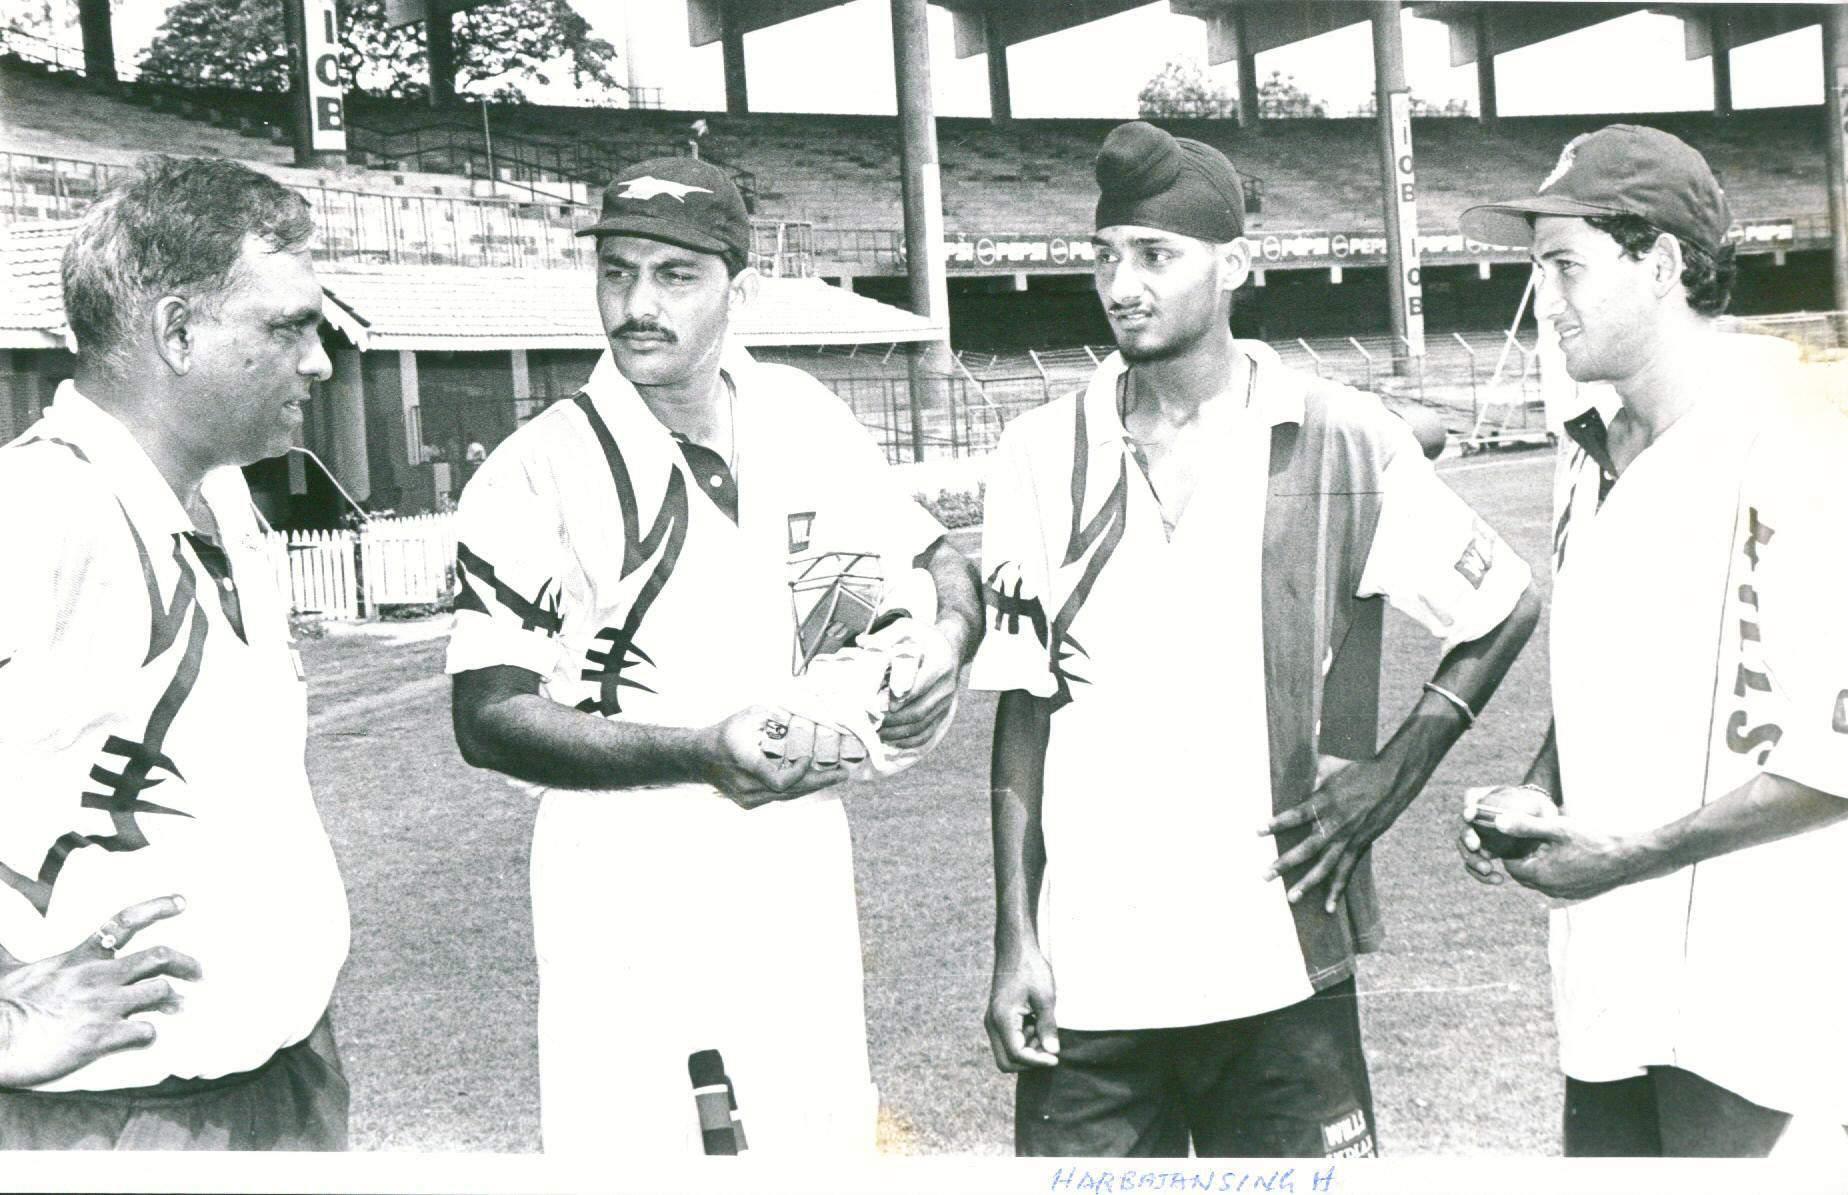 20. A Rare Pic Of Harbhajan Singh With Azharuddin And Ajit Agarkar